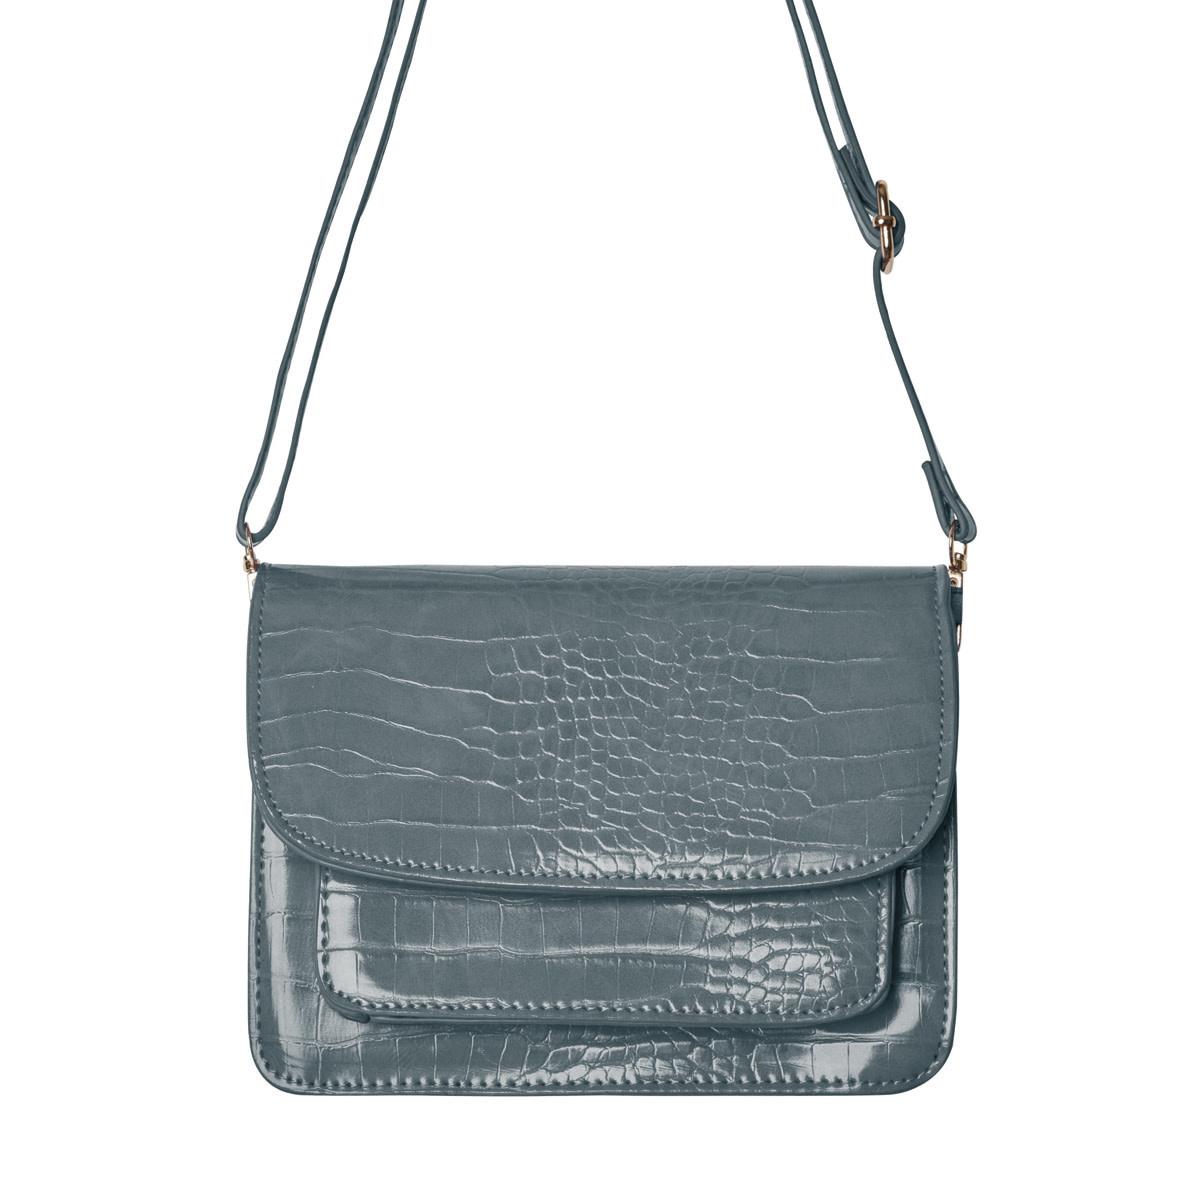 With love Bag Vogue - grey 21cm x 13.50cm x 7cm